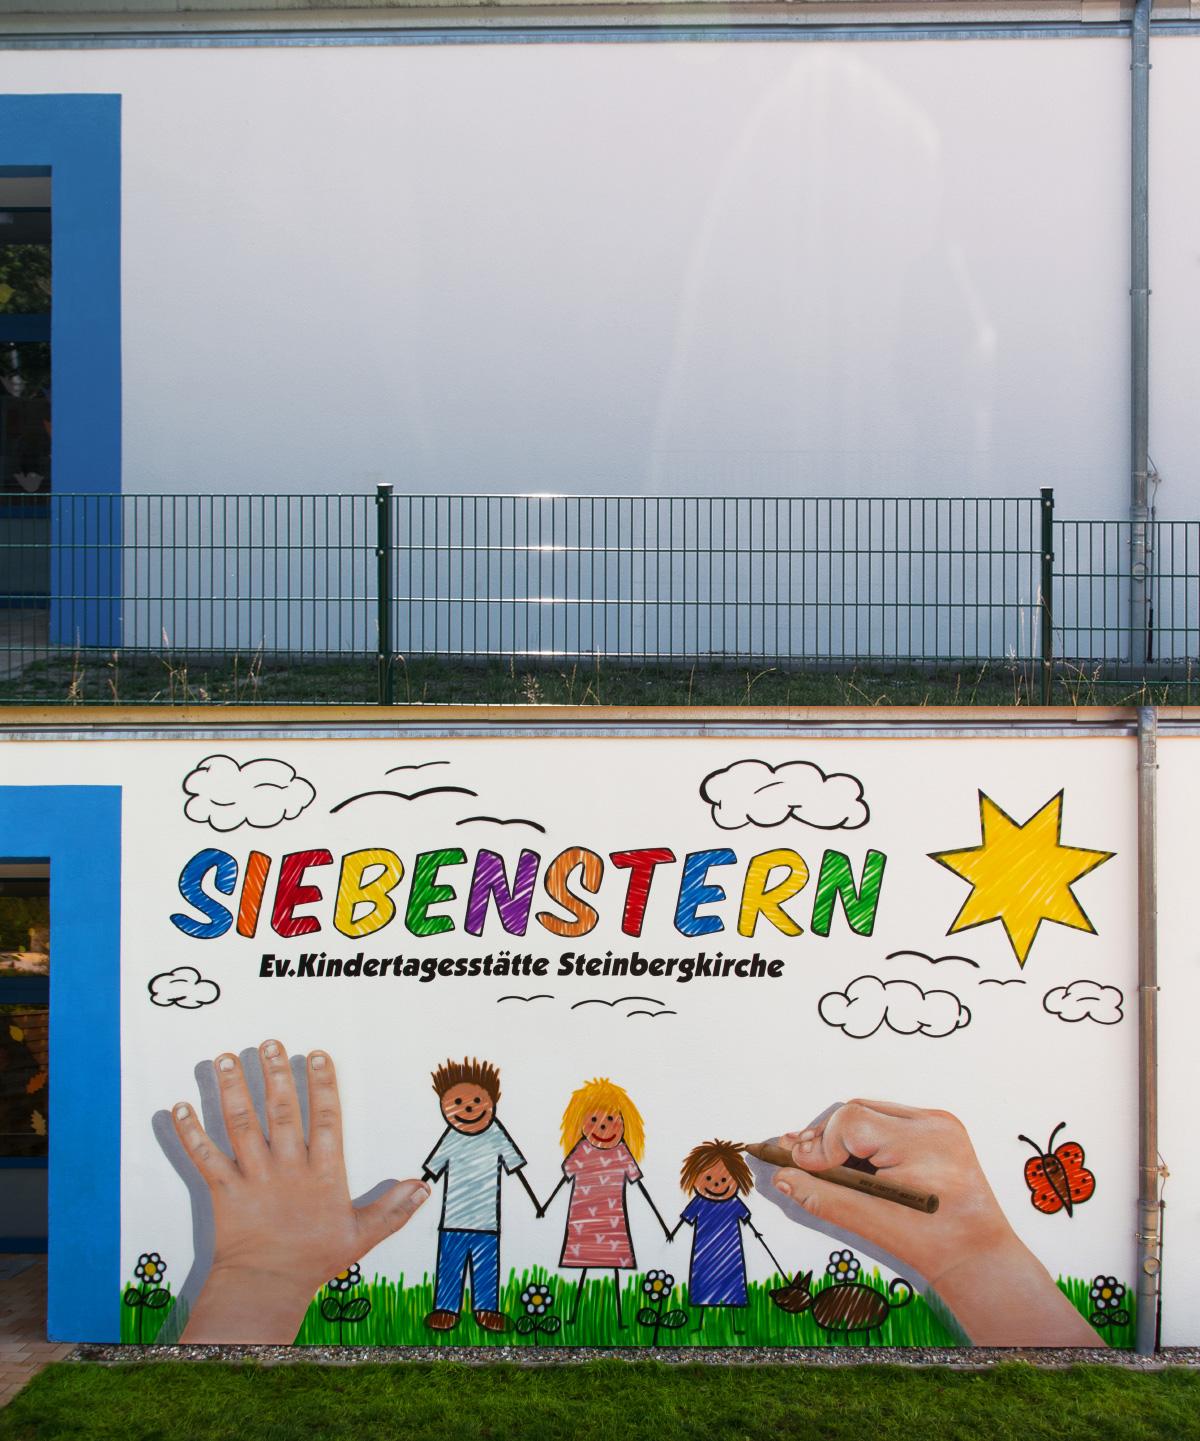 fassadengestaltung_wandbild_graffiti_kita_kindergarten_siebenstern_06